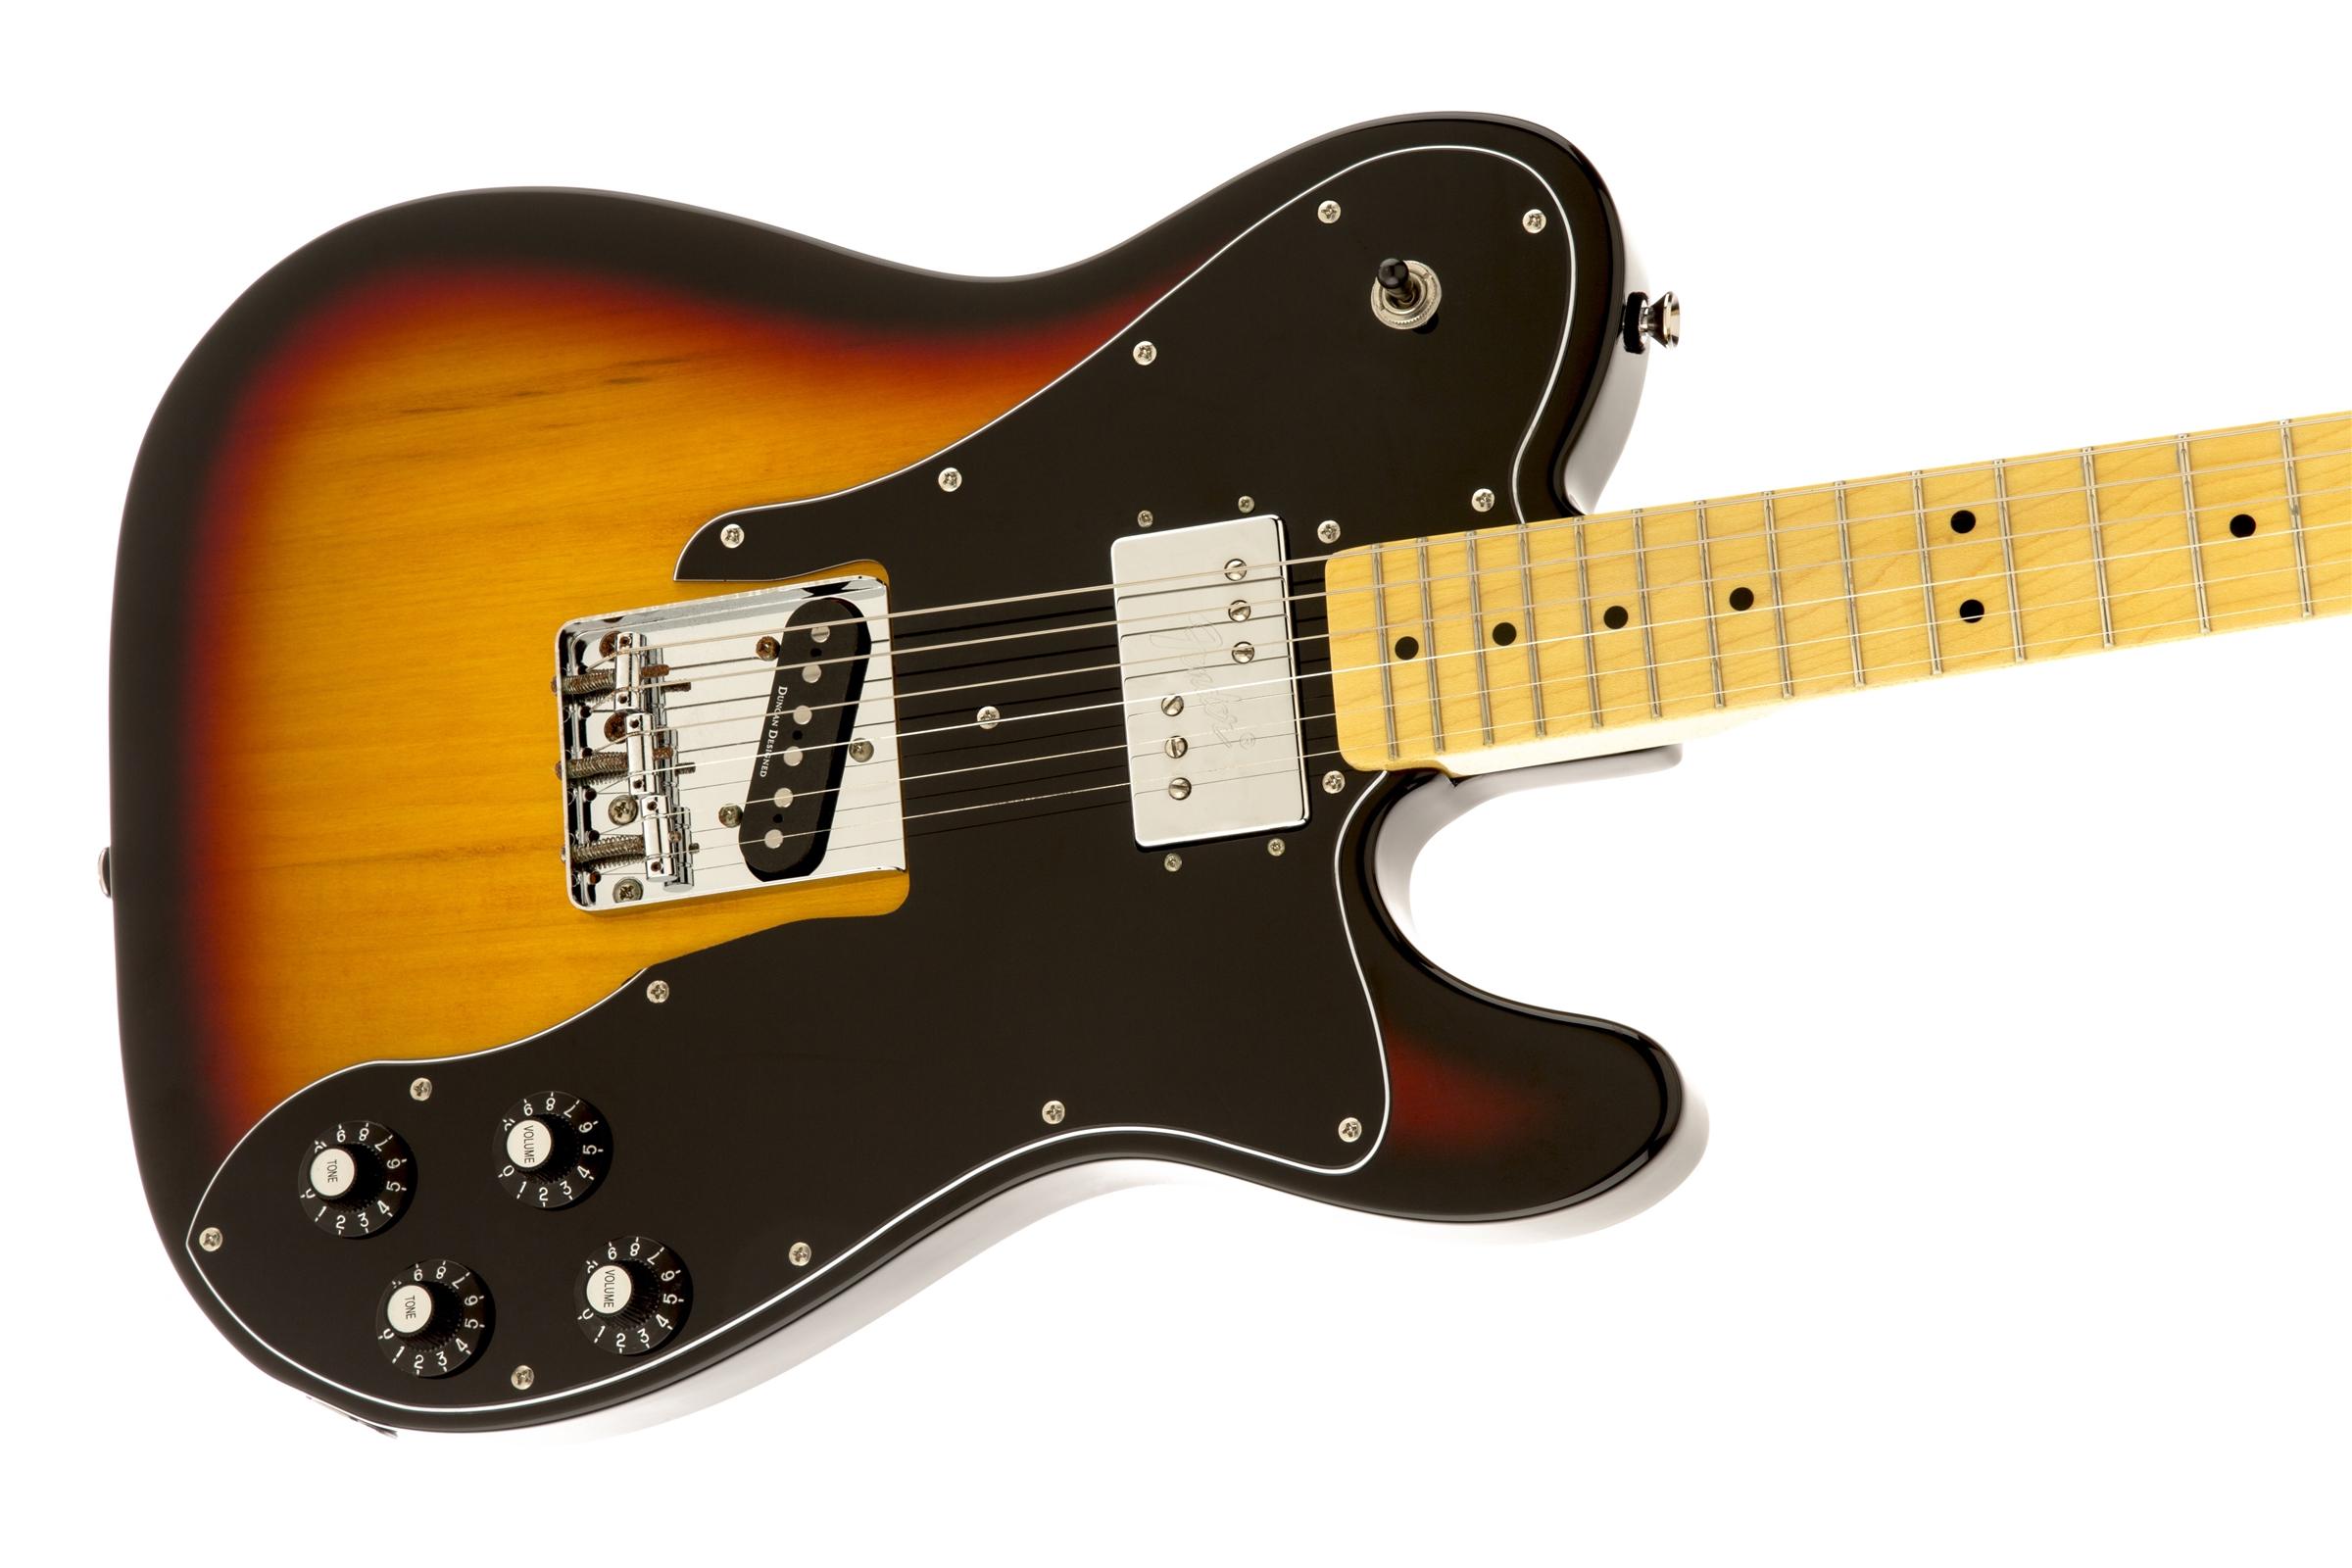 squier vintage modified telecaster custom squier electric guitars. Black Bedroom Furniture Sets. Home Design Ideas